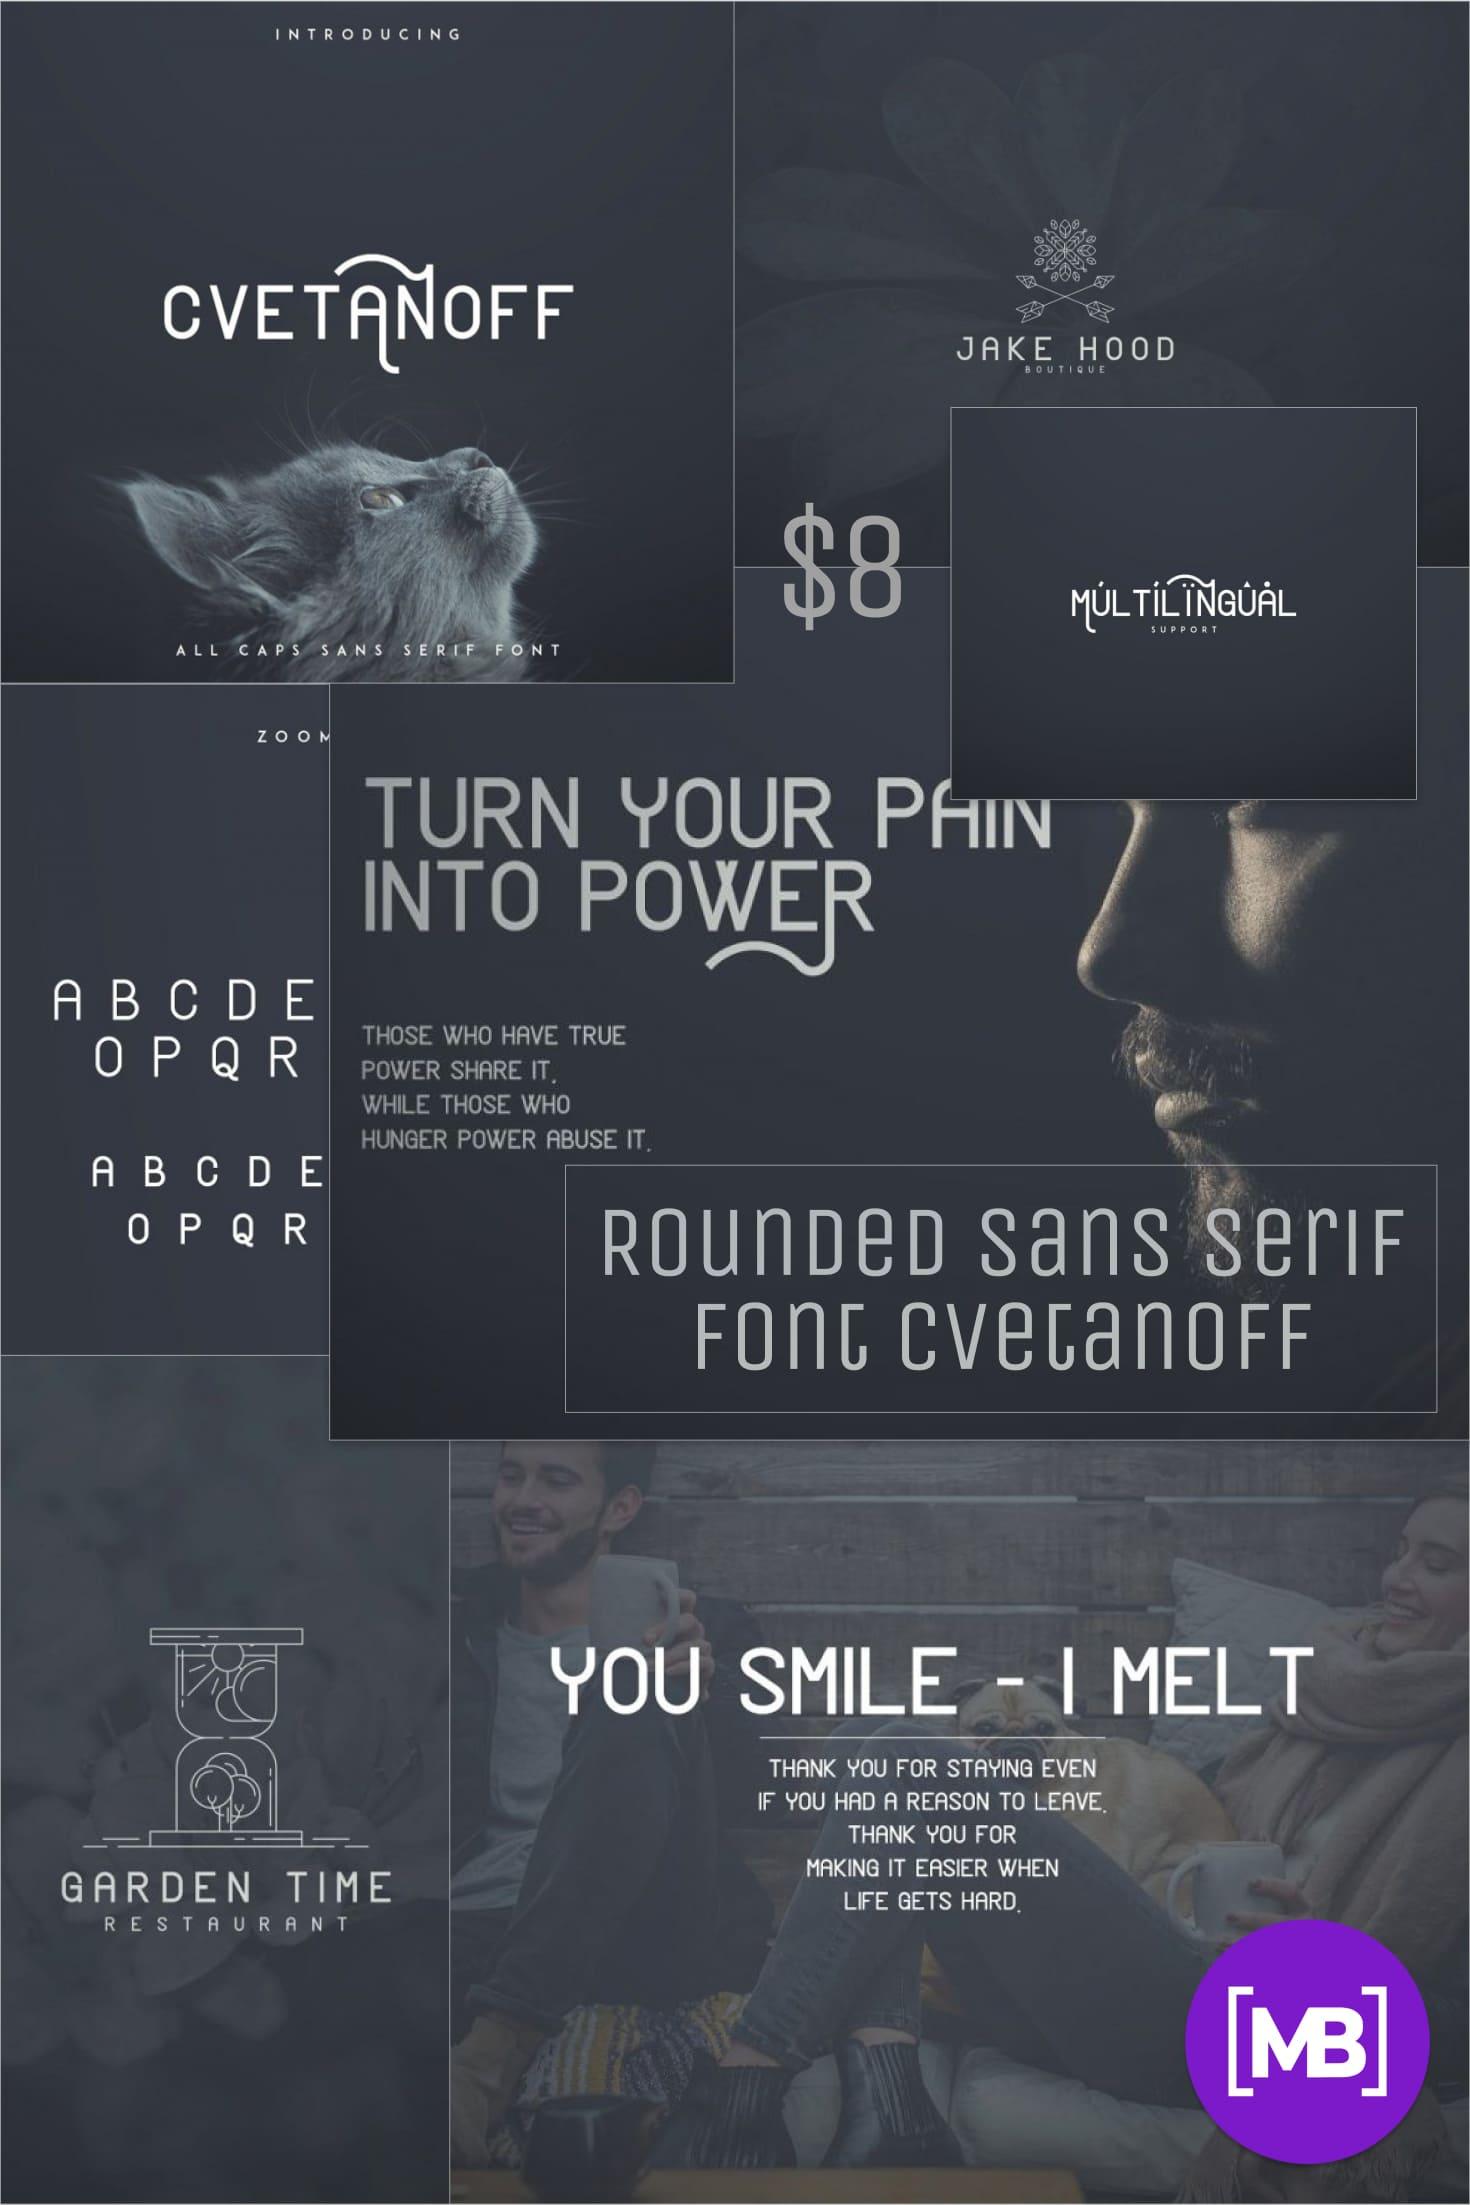 Pinterest Image: Rounded Sans Serif Font Cvetanoff -30%.